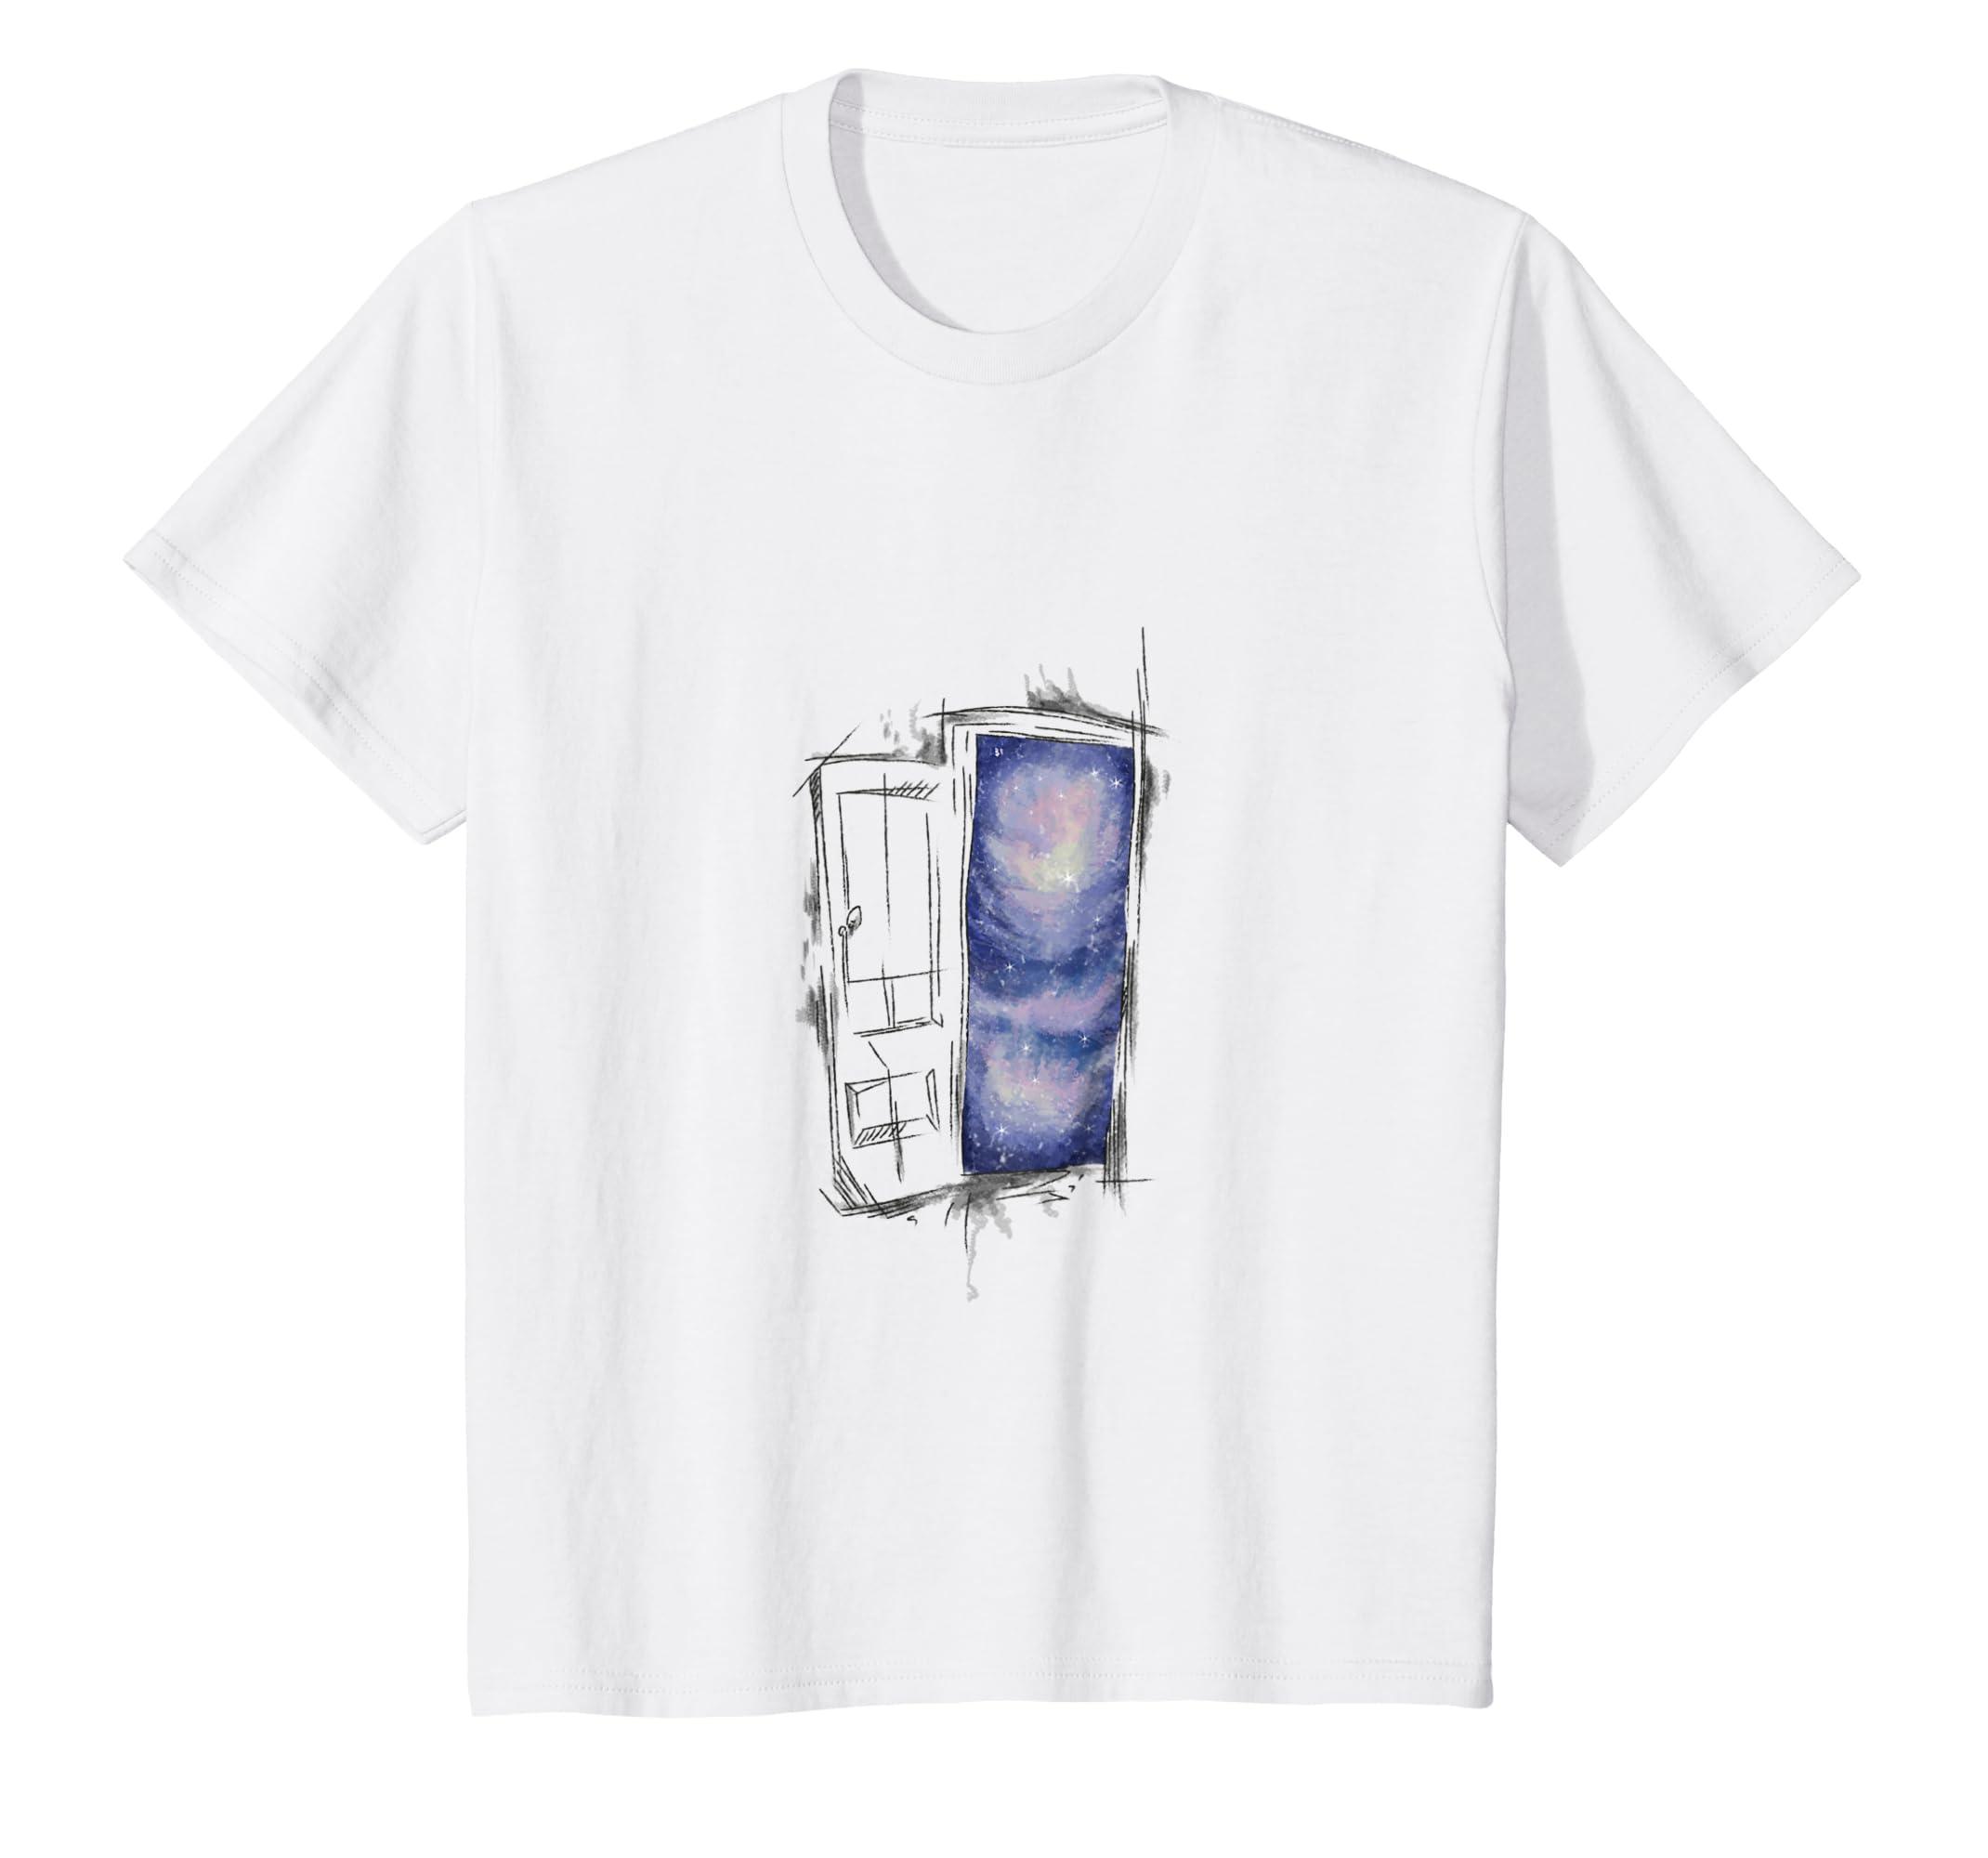 Geometric Open Door Blue Space Emptiness Abstract Tee Shirt-Teesml